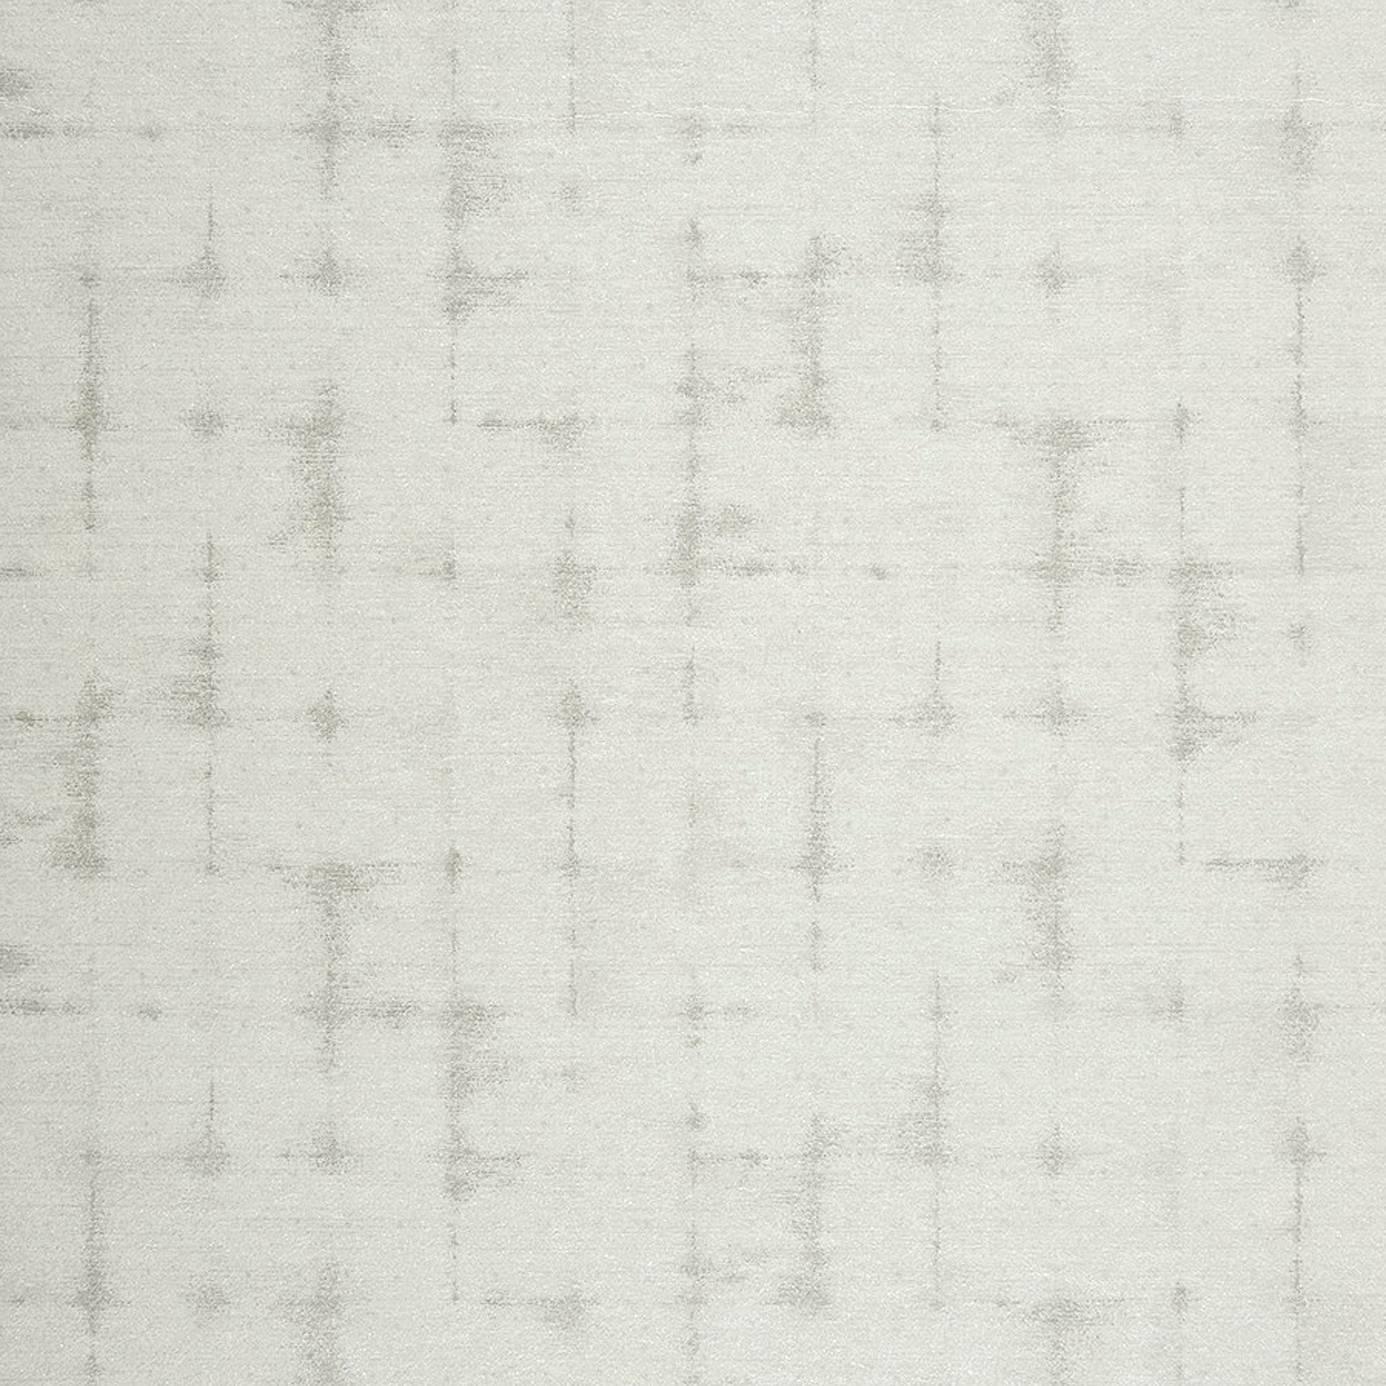 Французские обои Casadeco,  коллекция So White 2, артикулSWI25261033